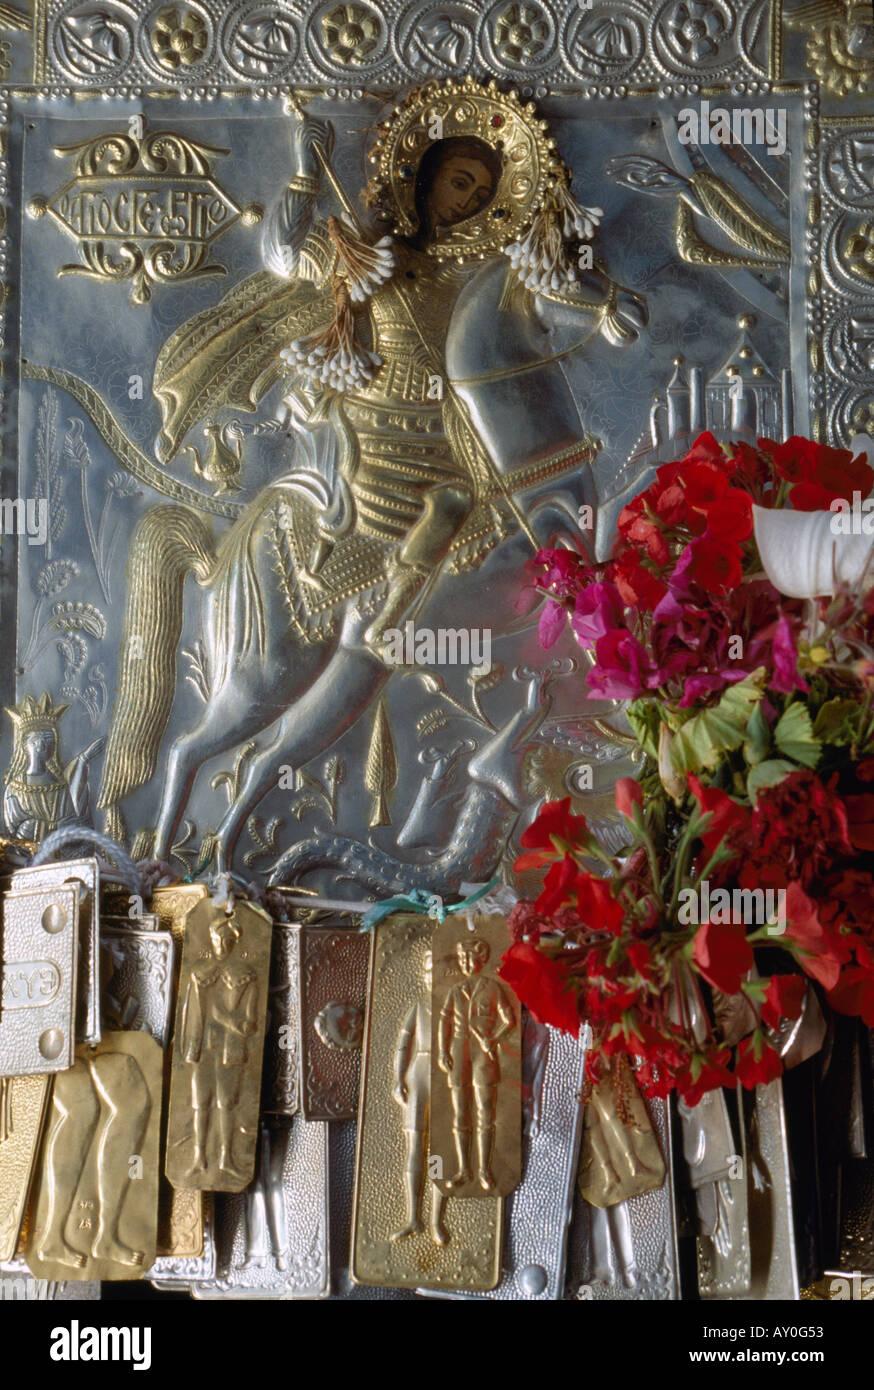 Kassos, Fri, Kloster Agios Georgis Chadion, Relief - Stock Image